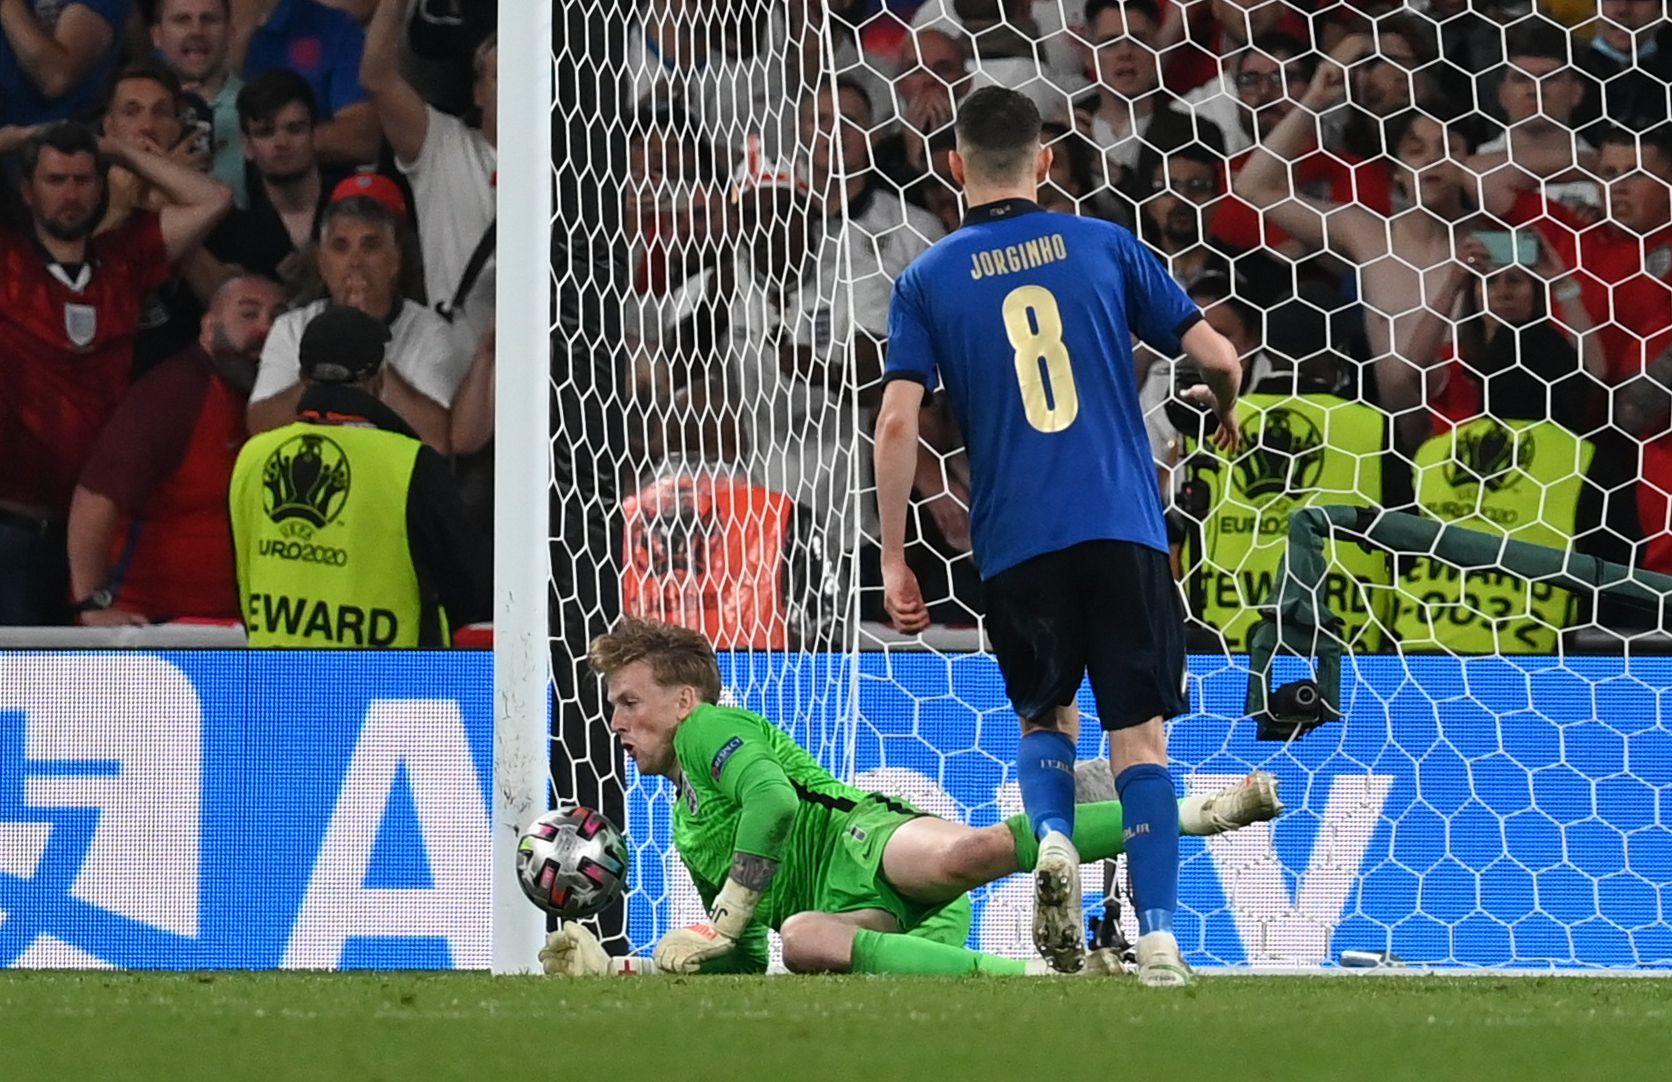 penaltis-2.jpg